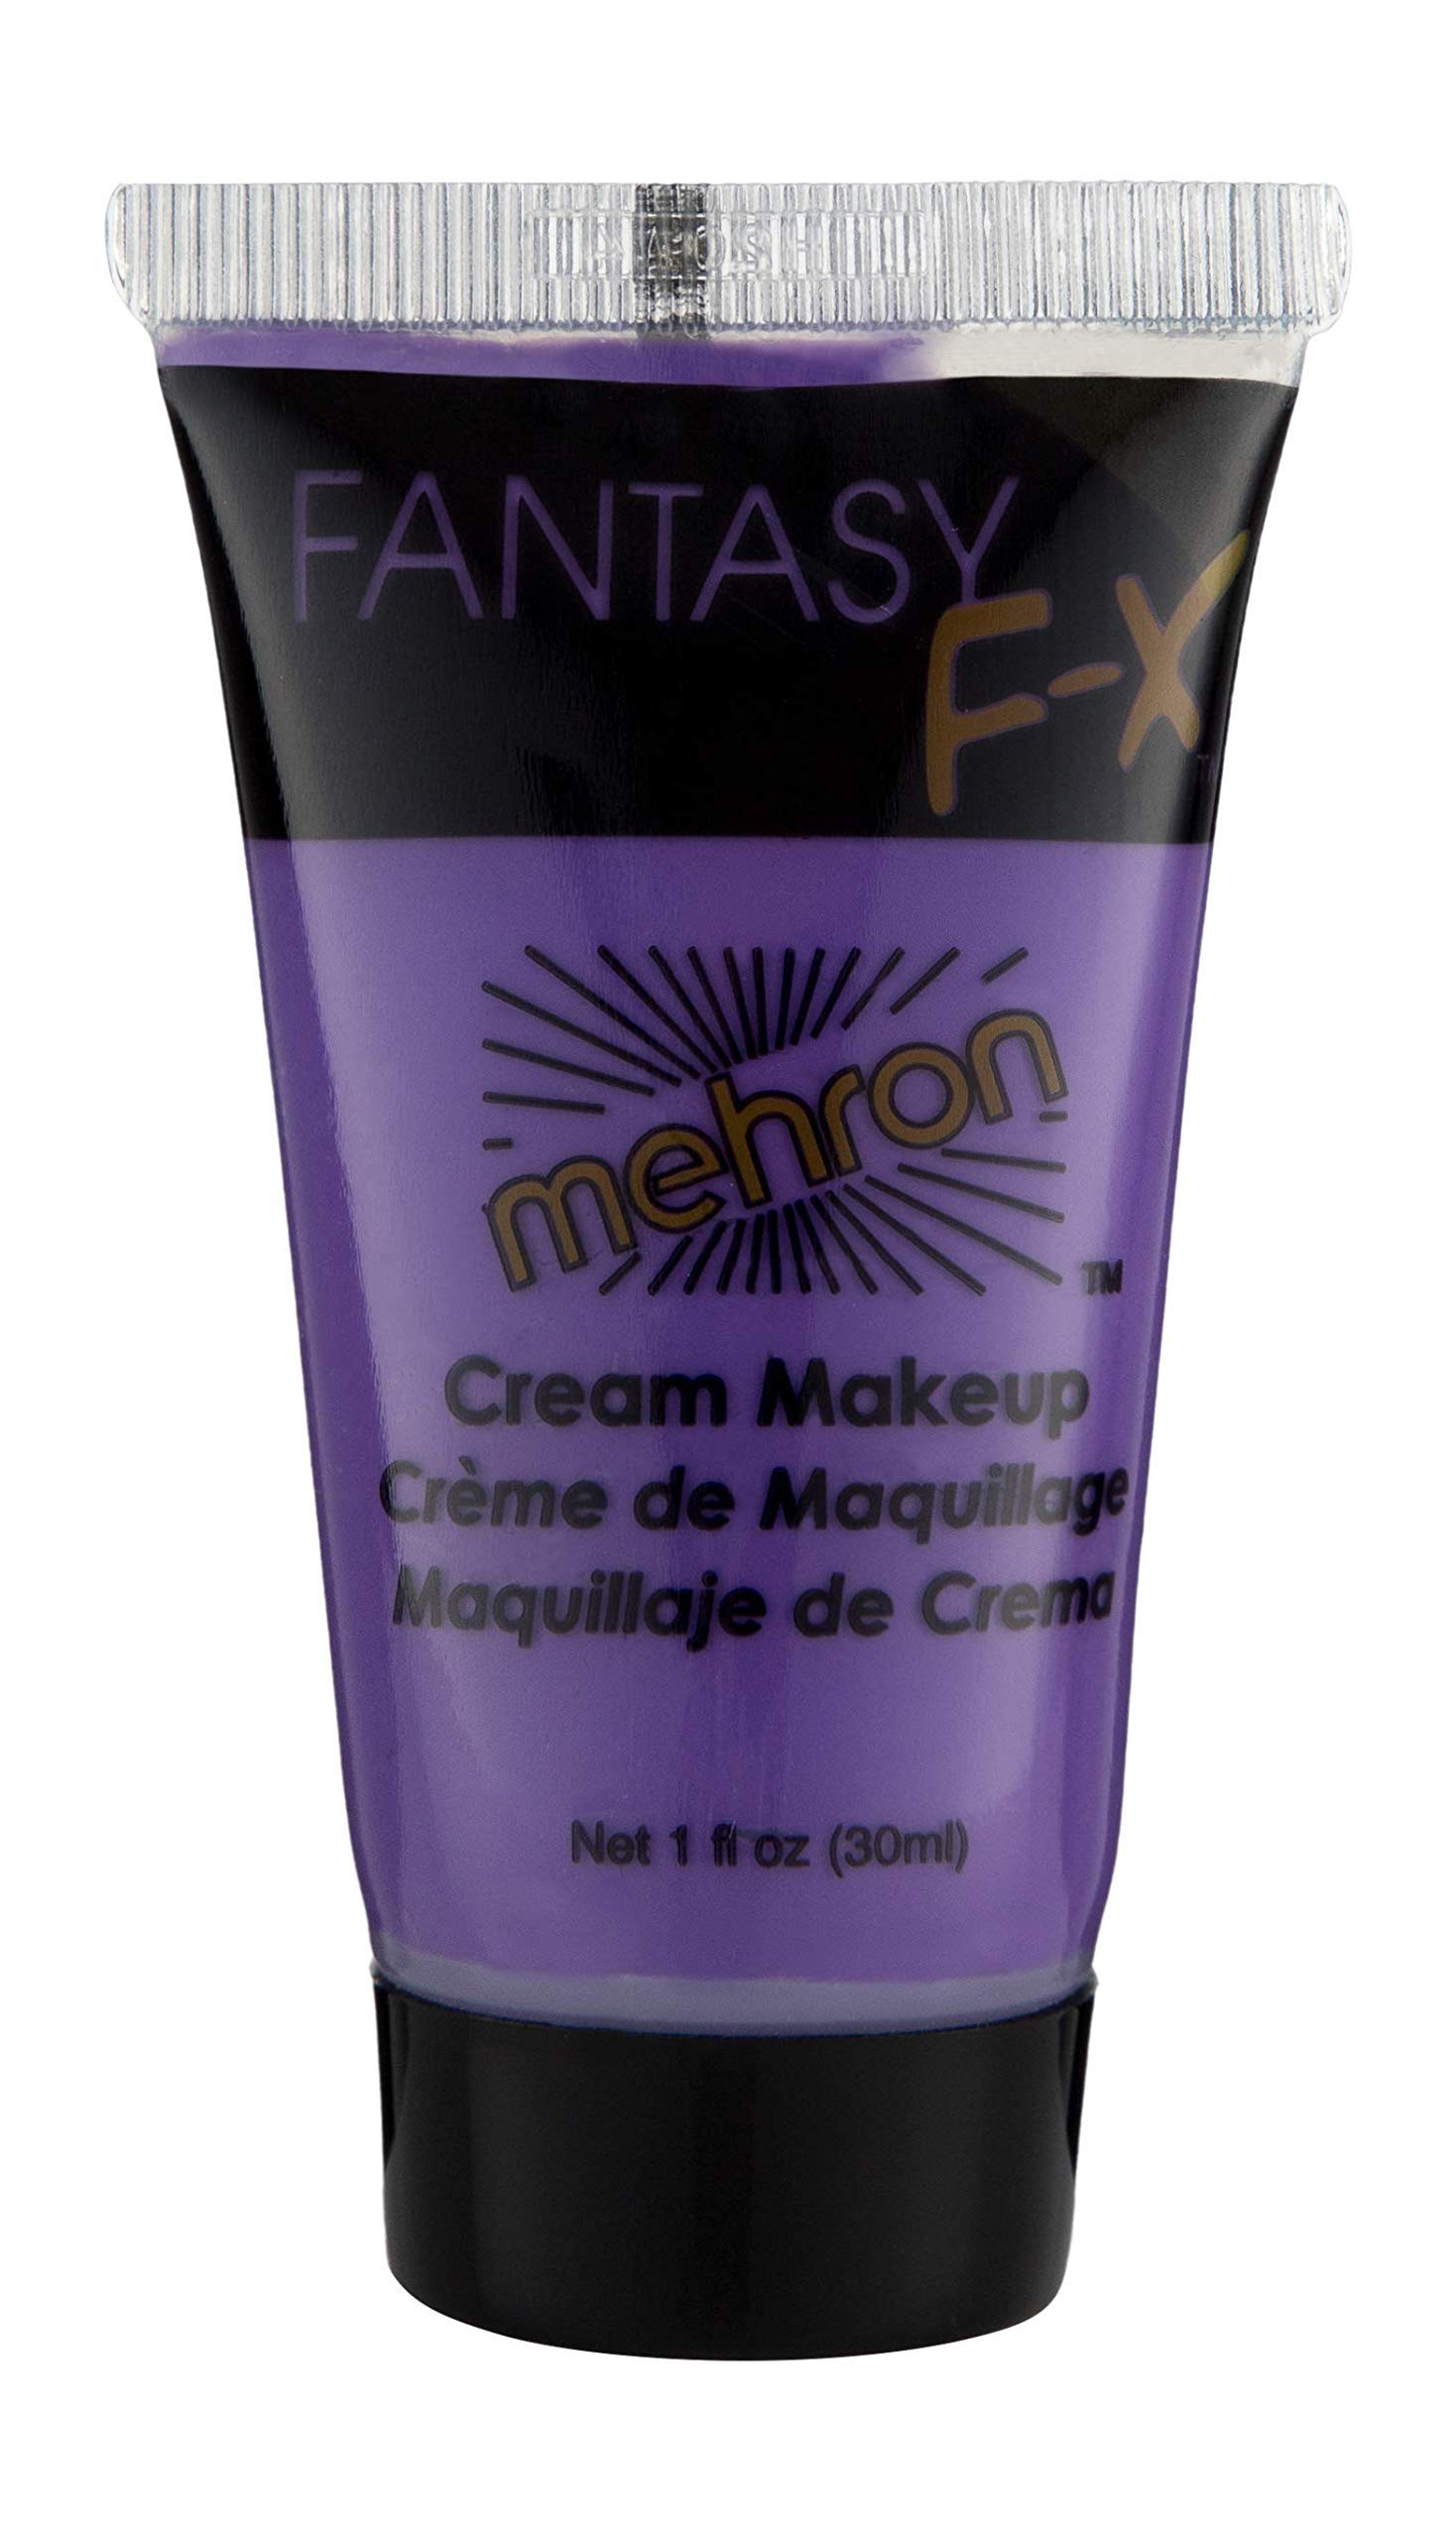 Mehron Makeup Fantasy F/X Water Based Face & Body Paint (1 oz) (PURPLE)